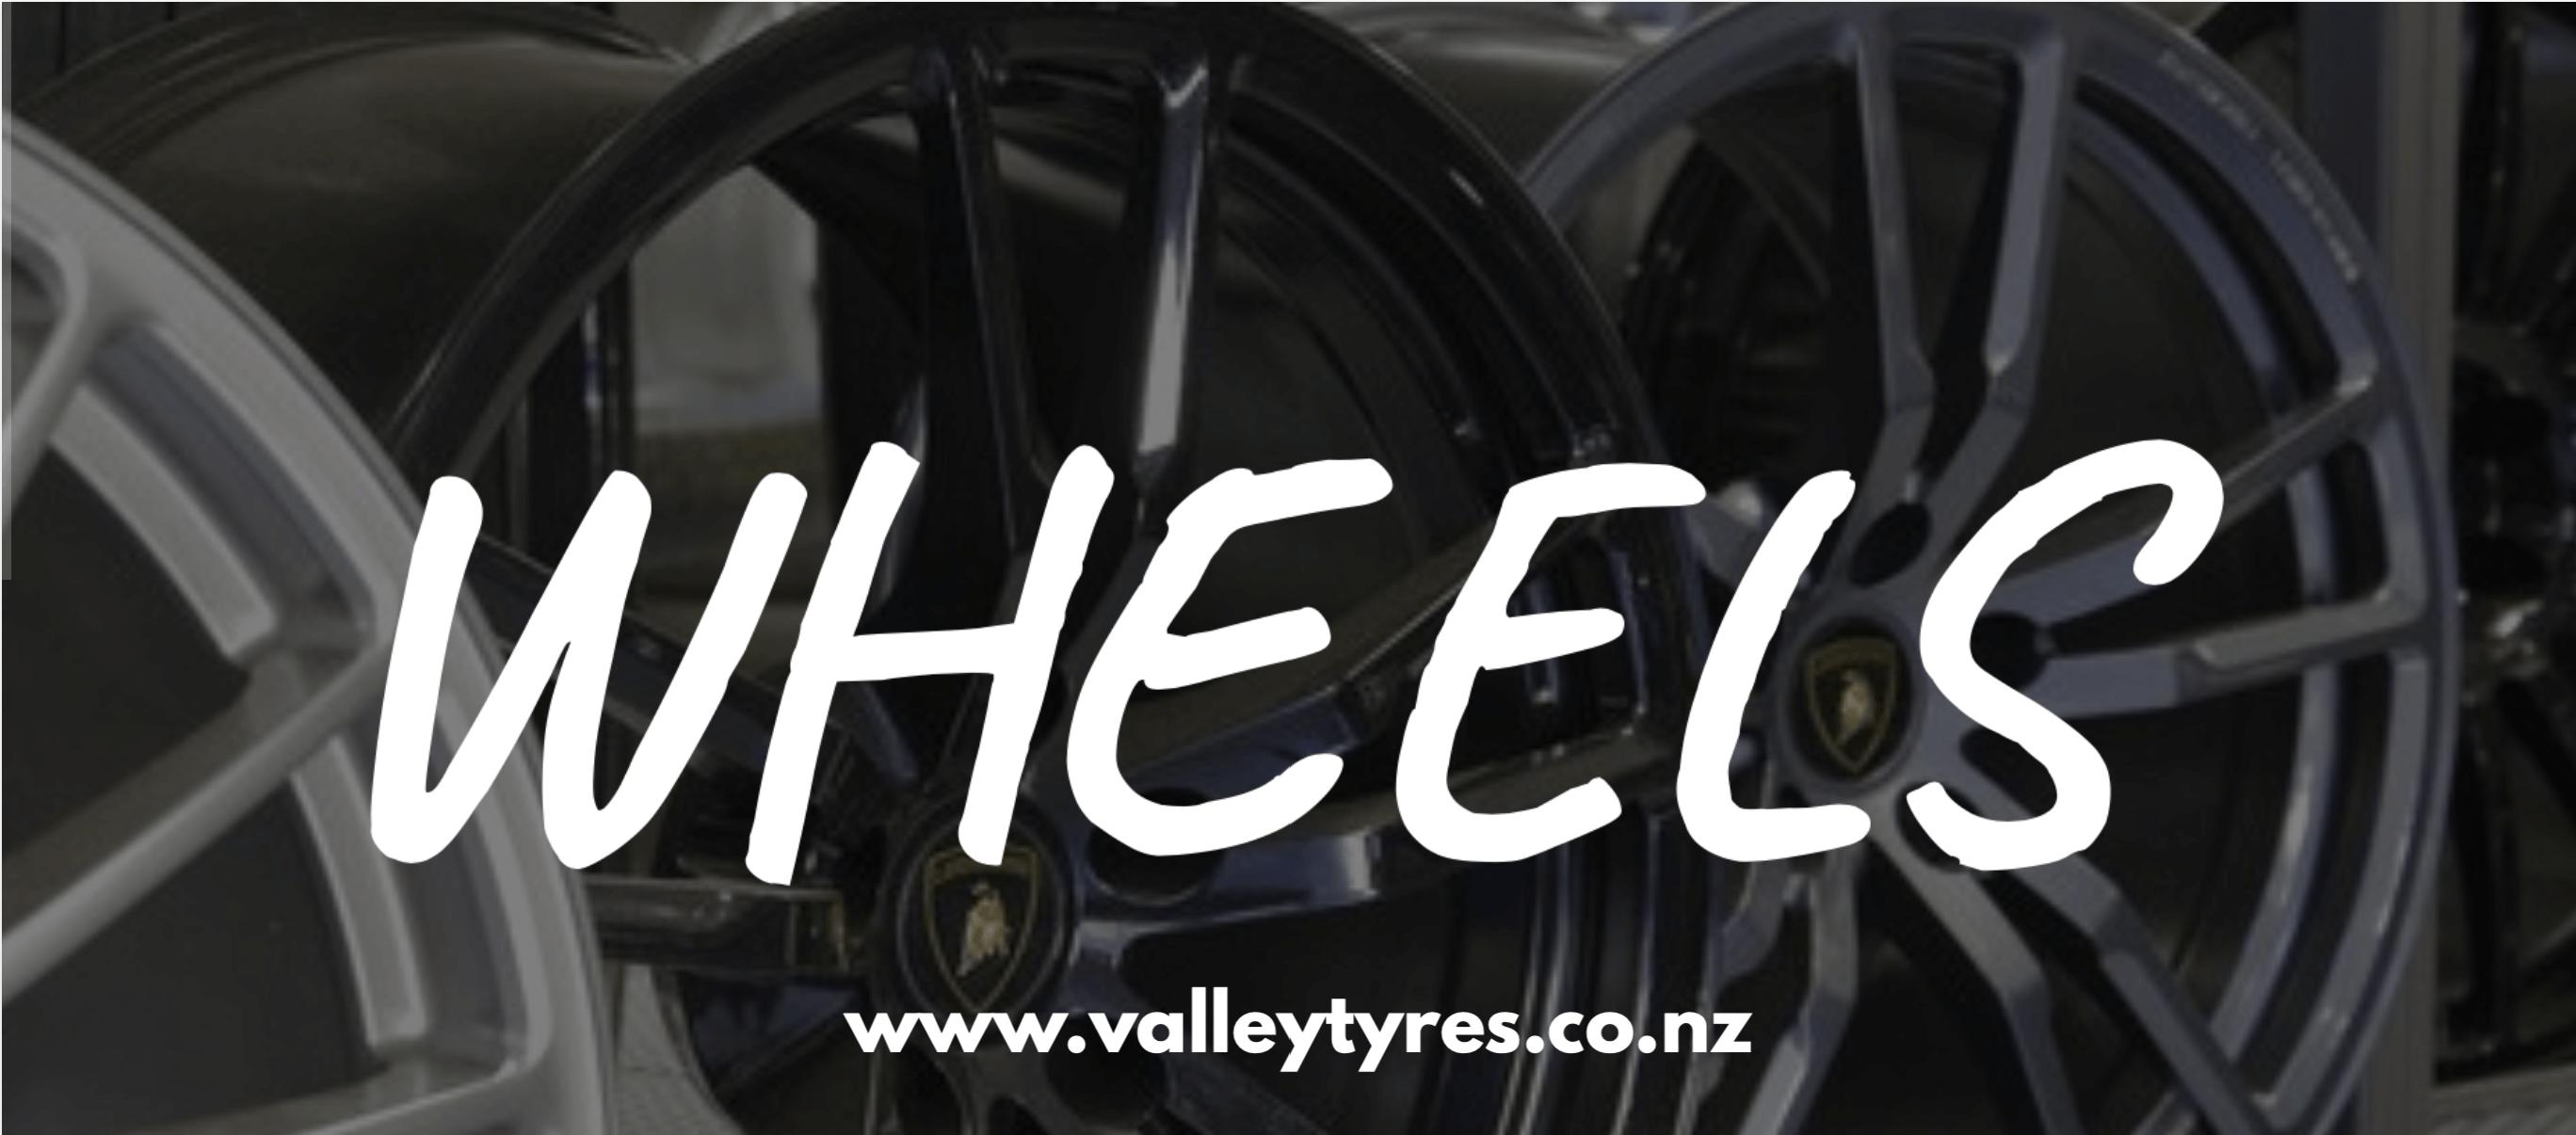 Wheel & Tyre Combo valley tyres 2021